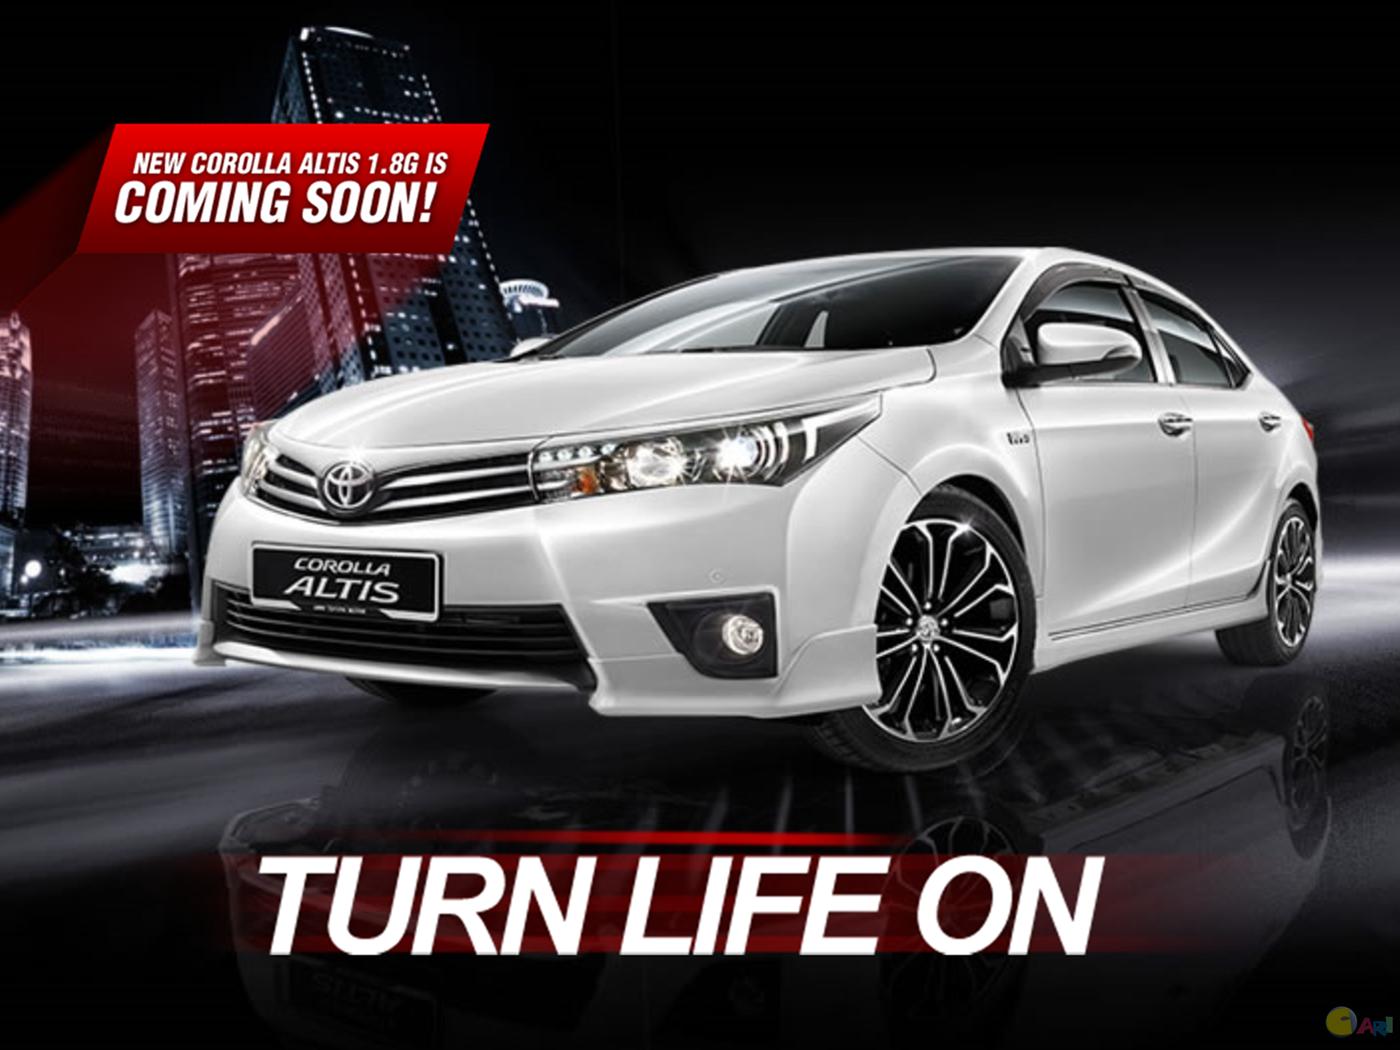 ������������Toyota Corolla Altis 1.8G ȡ�� 2.0G